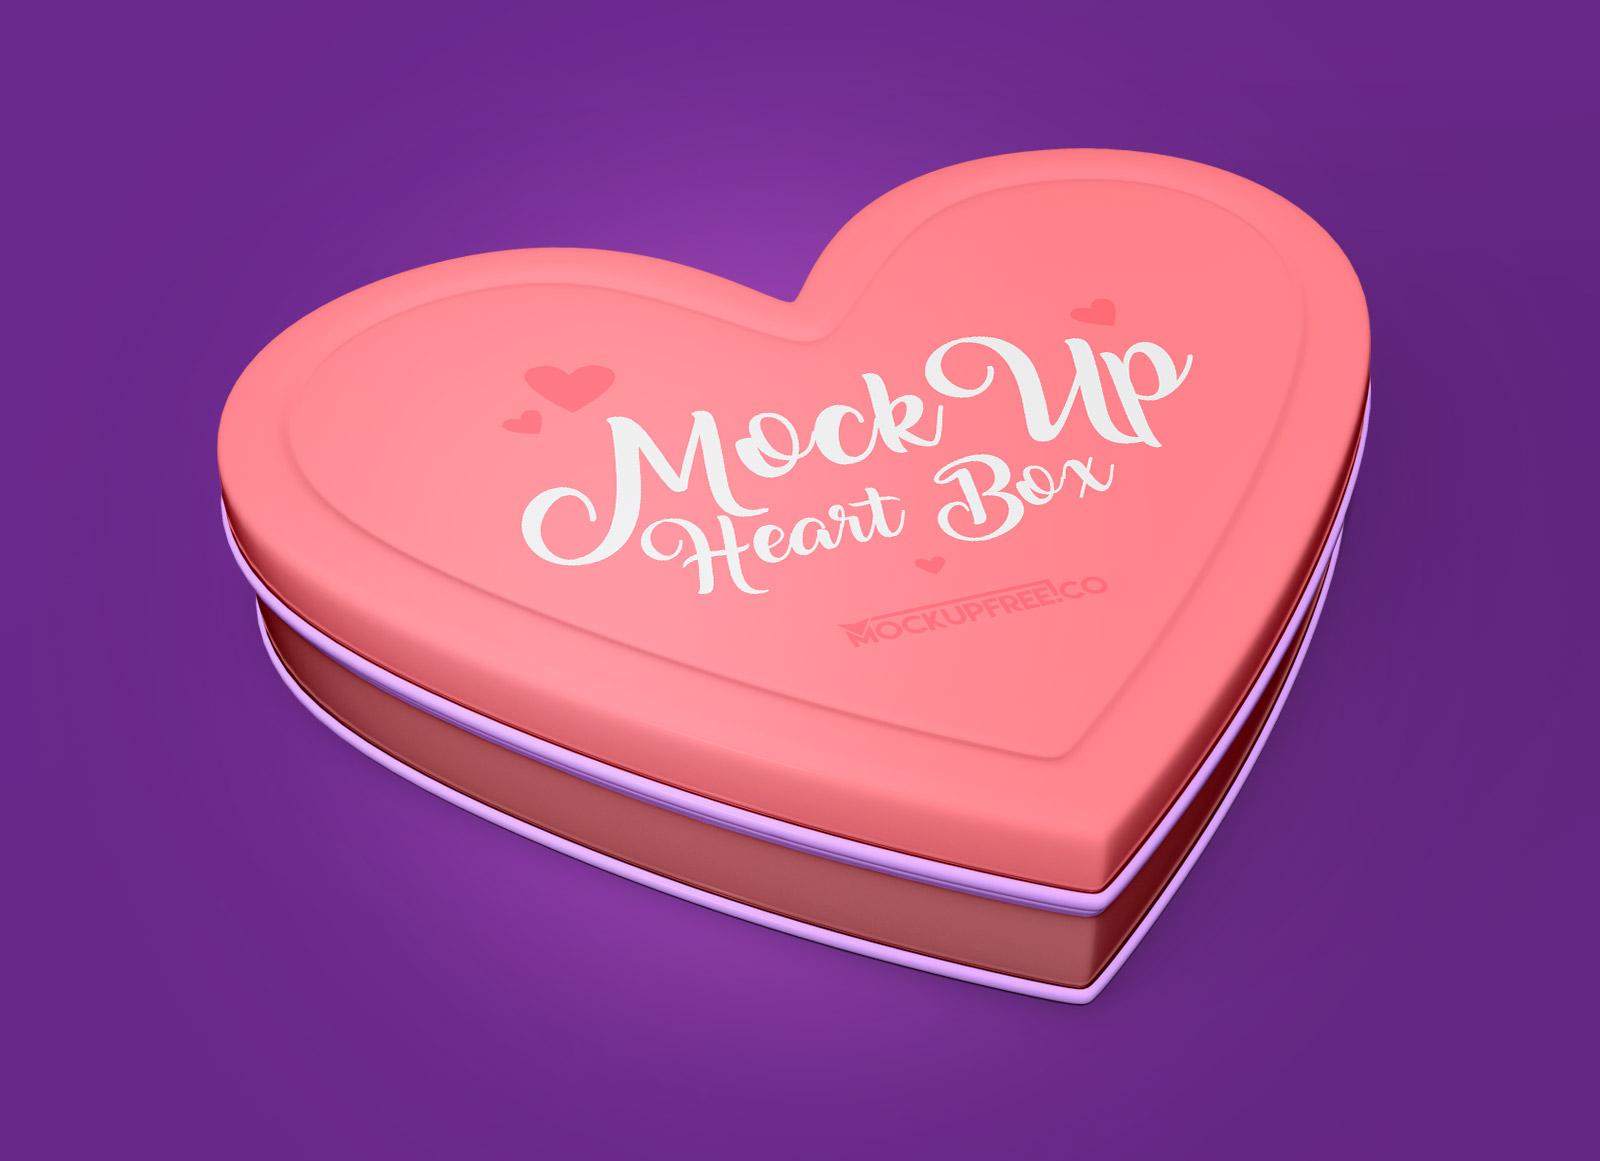 Free-Heart-Shape-Tin-Box-Mockup-PSD-File-2